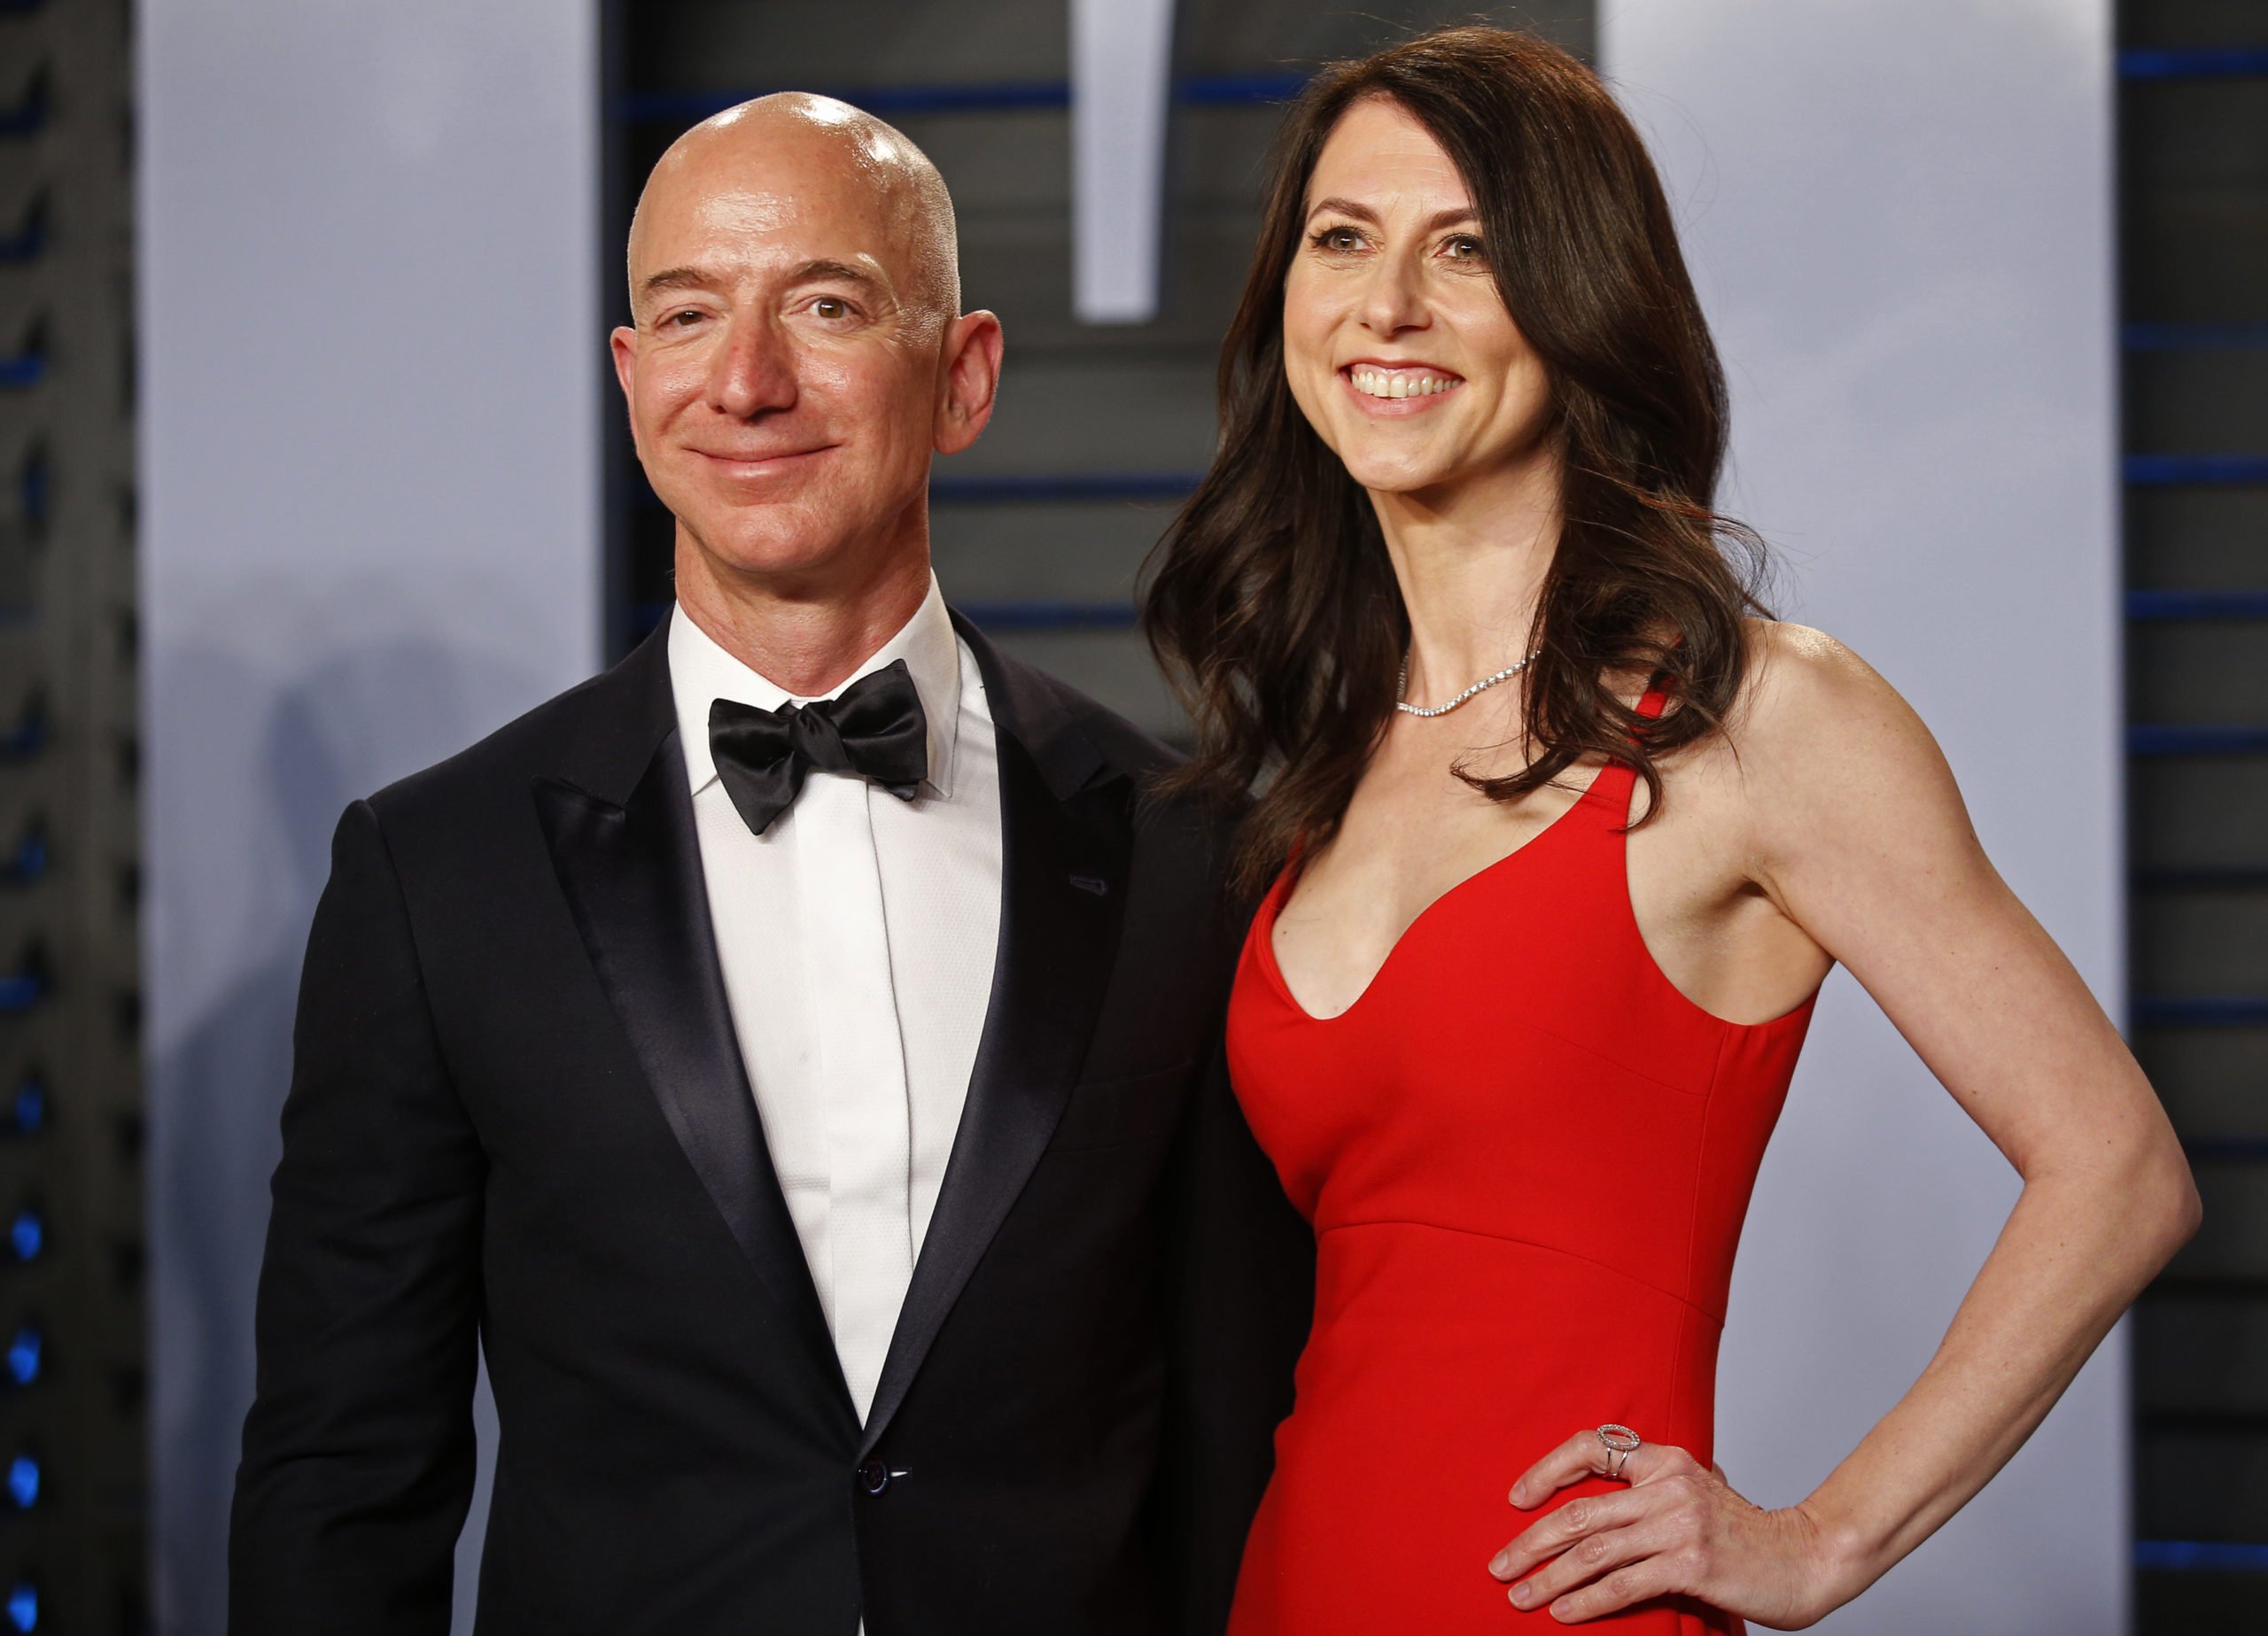 La ex esposa del fundador de Amazon dona 2,740 mdd a causas nobles